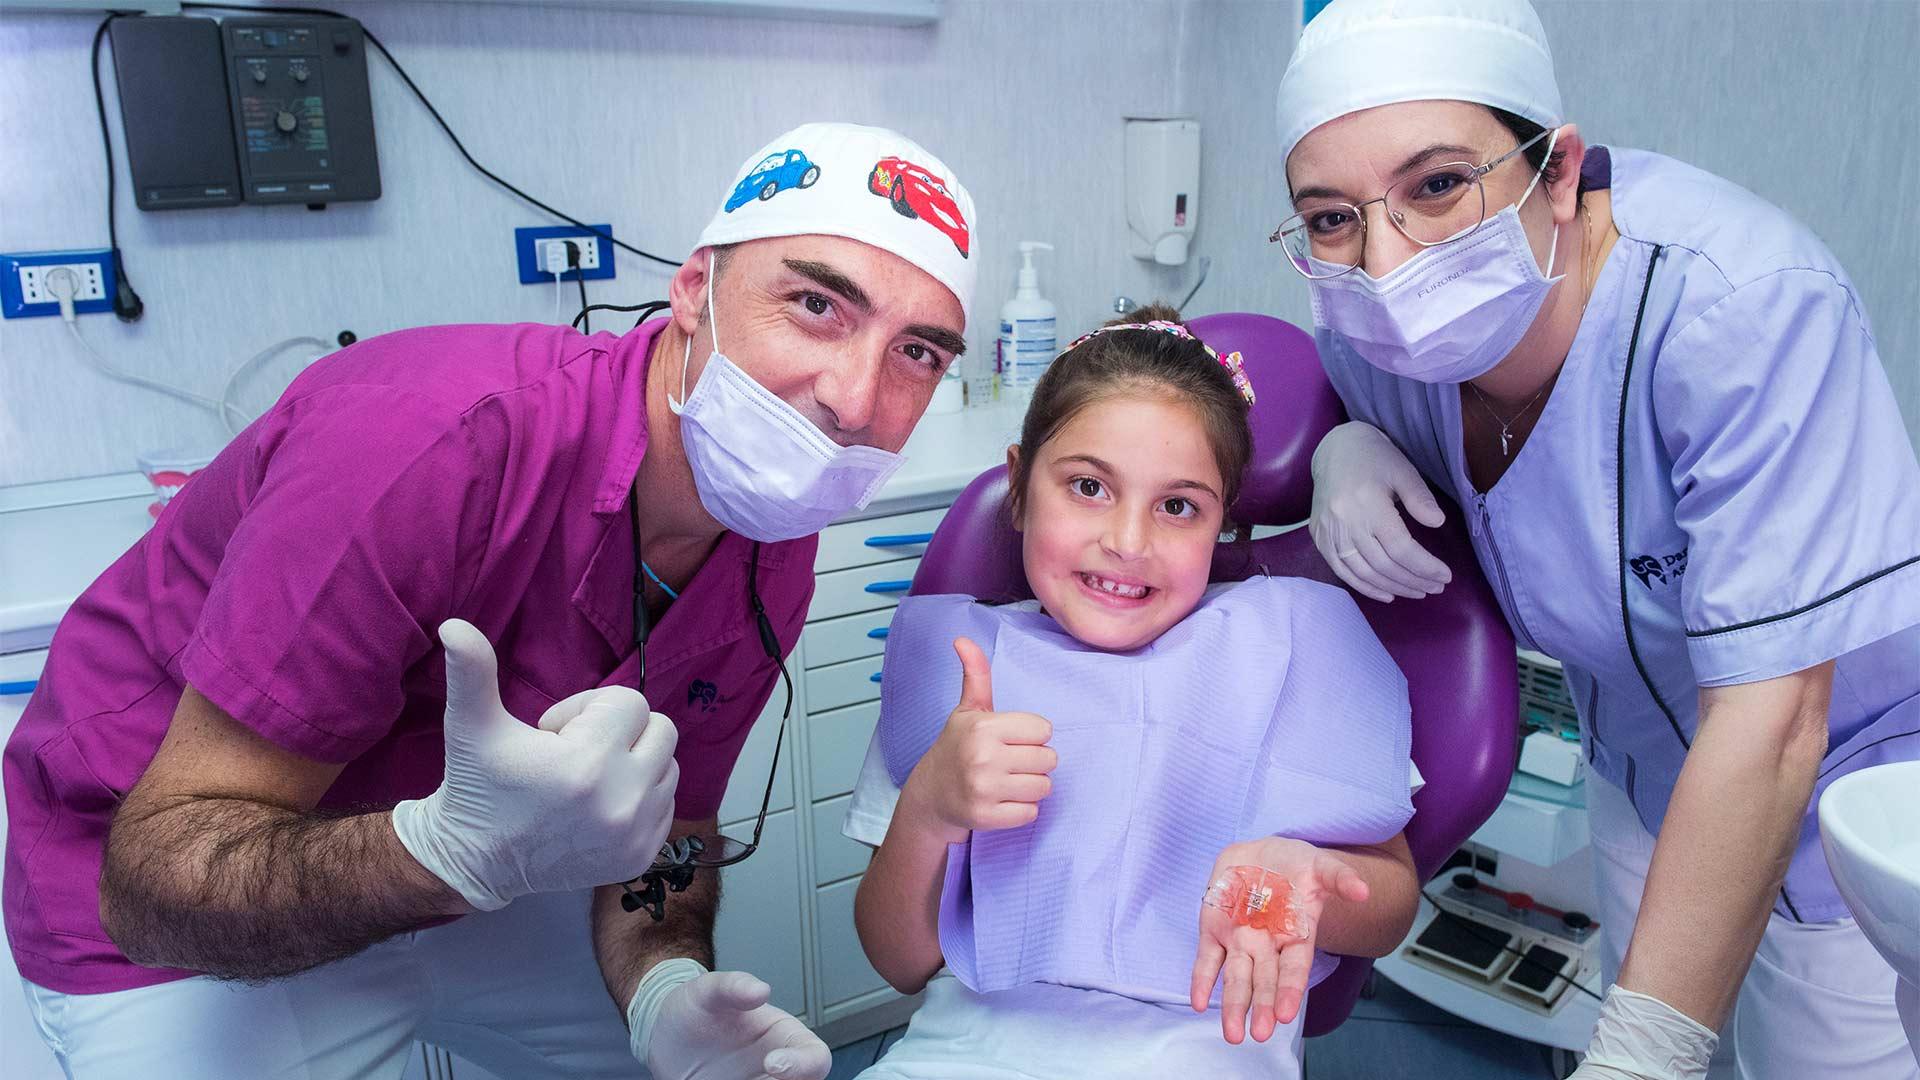 Studio dentistico Spinosa 6 | Dentista a Gaeta